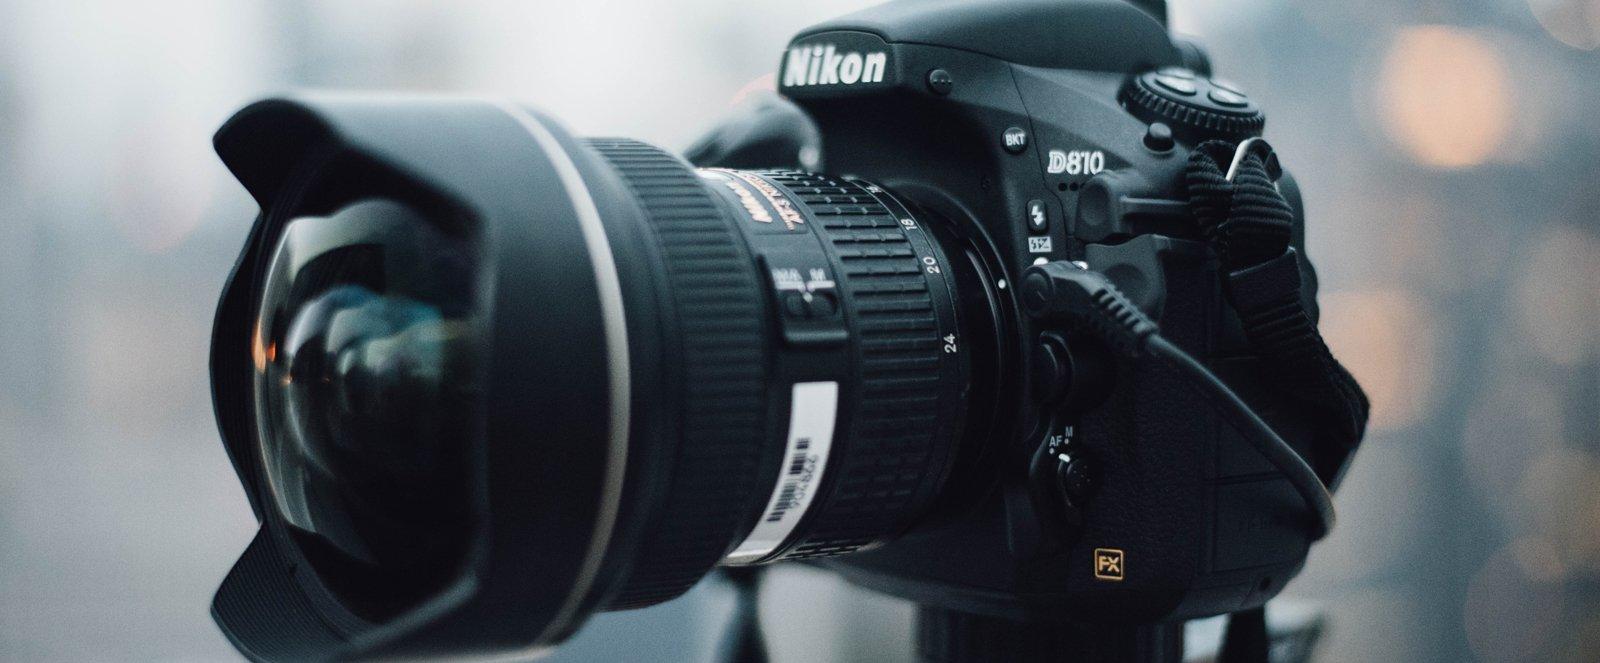 A close-up of a Nikon camera